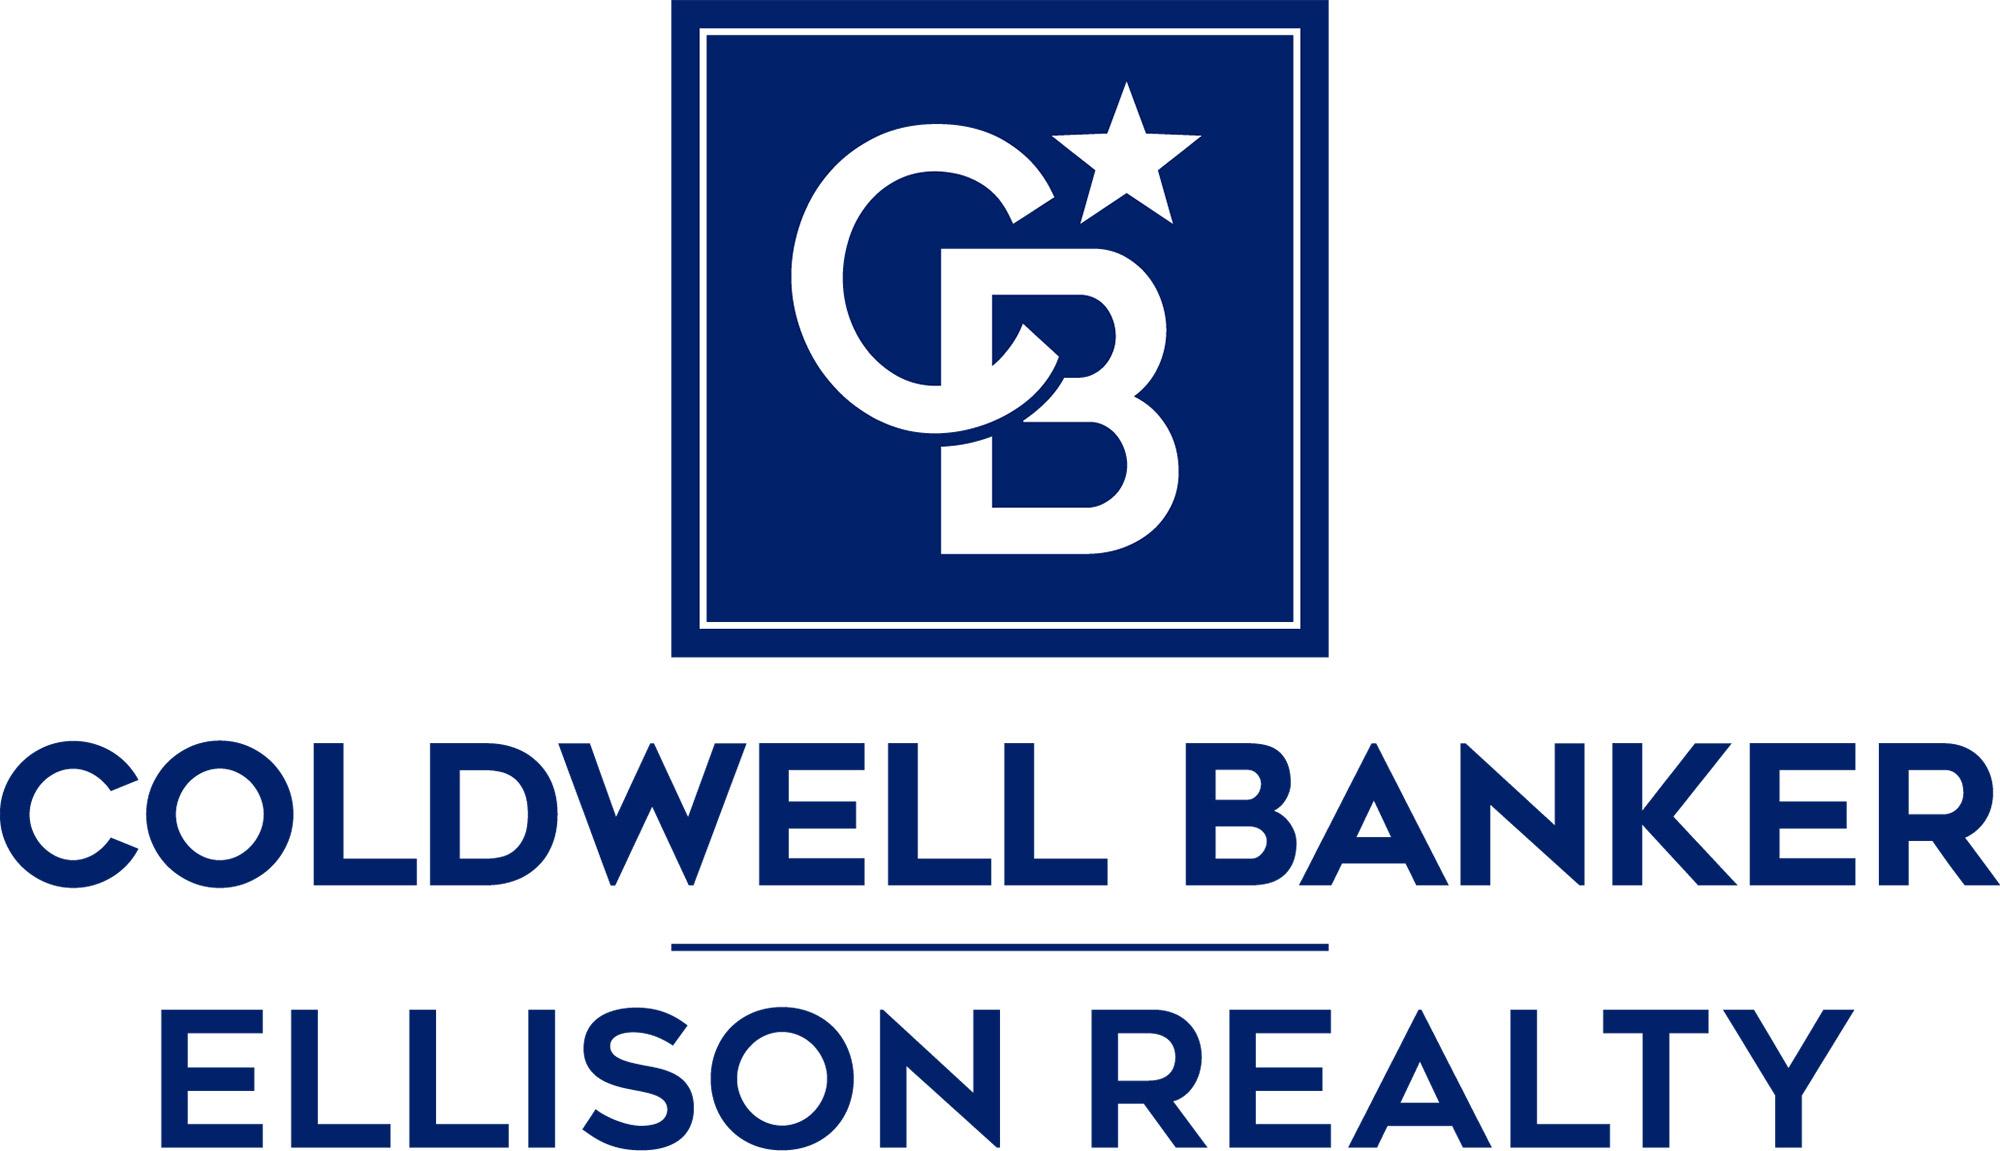 Kathryn Johnson - Coldwell Banker Ellison Realty Logo